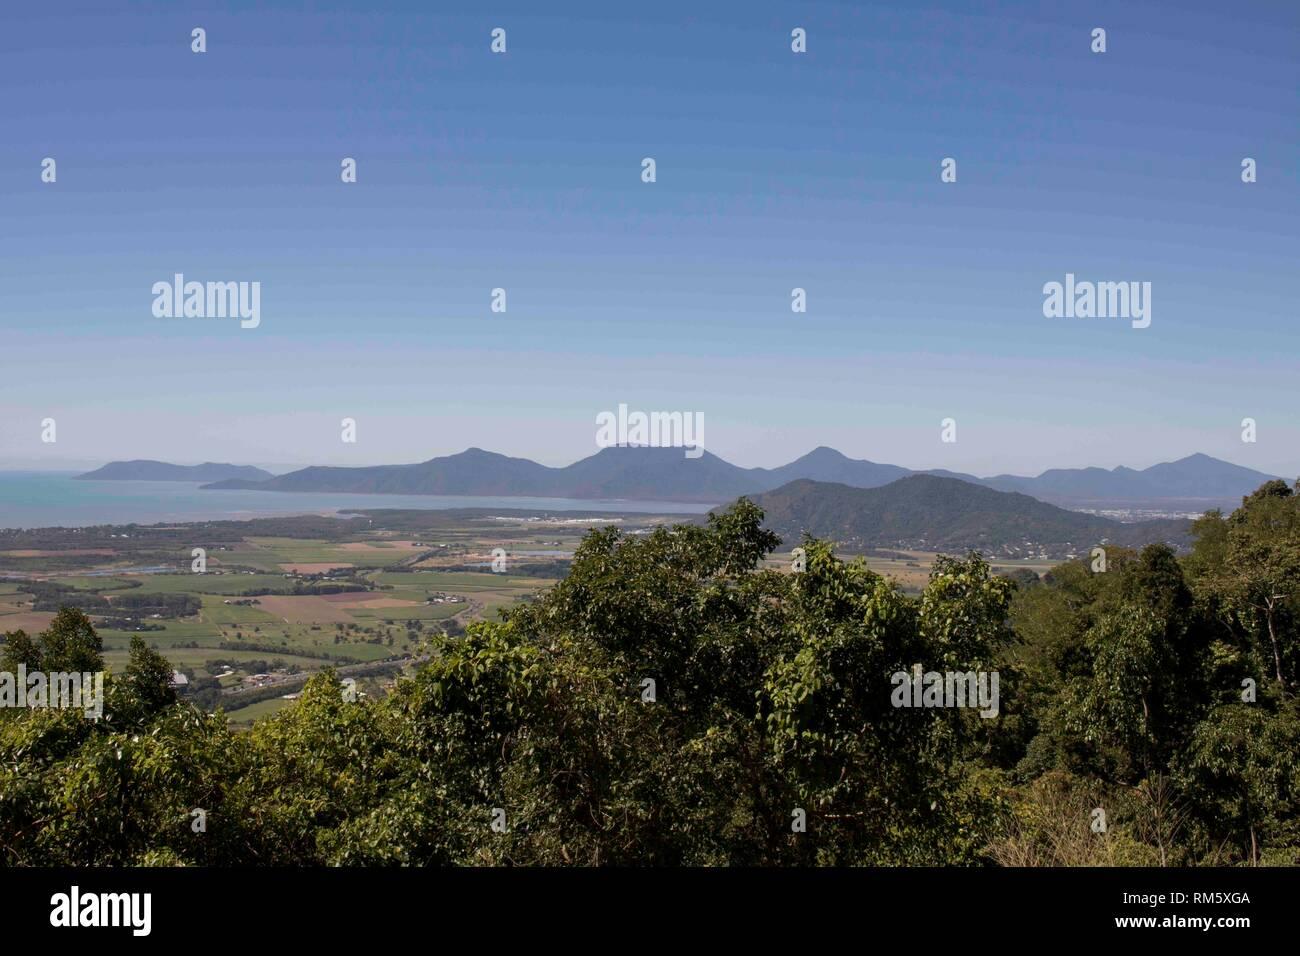 Mountain view on a sunny day, East Coast Australia Stock Photo